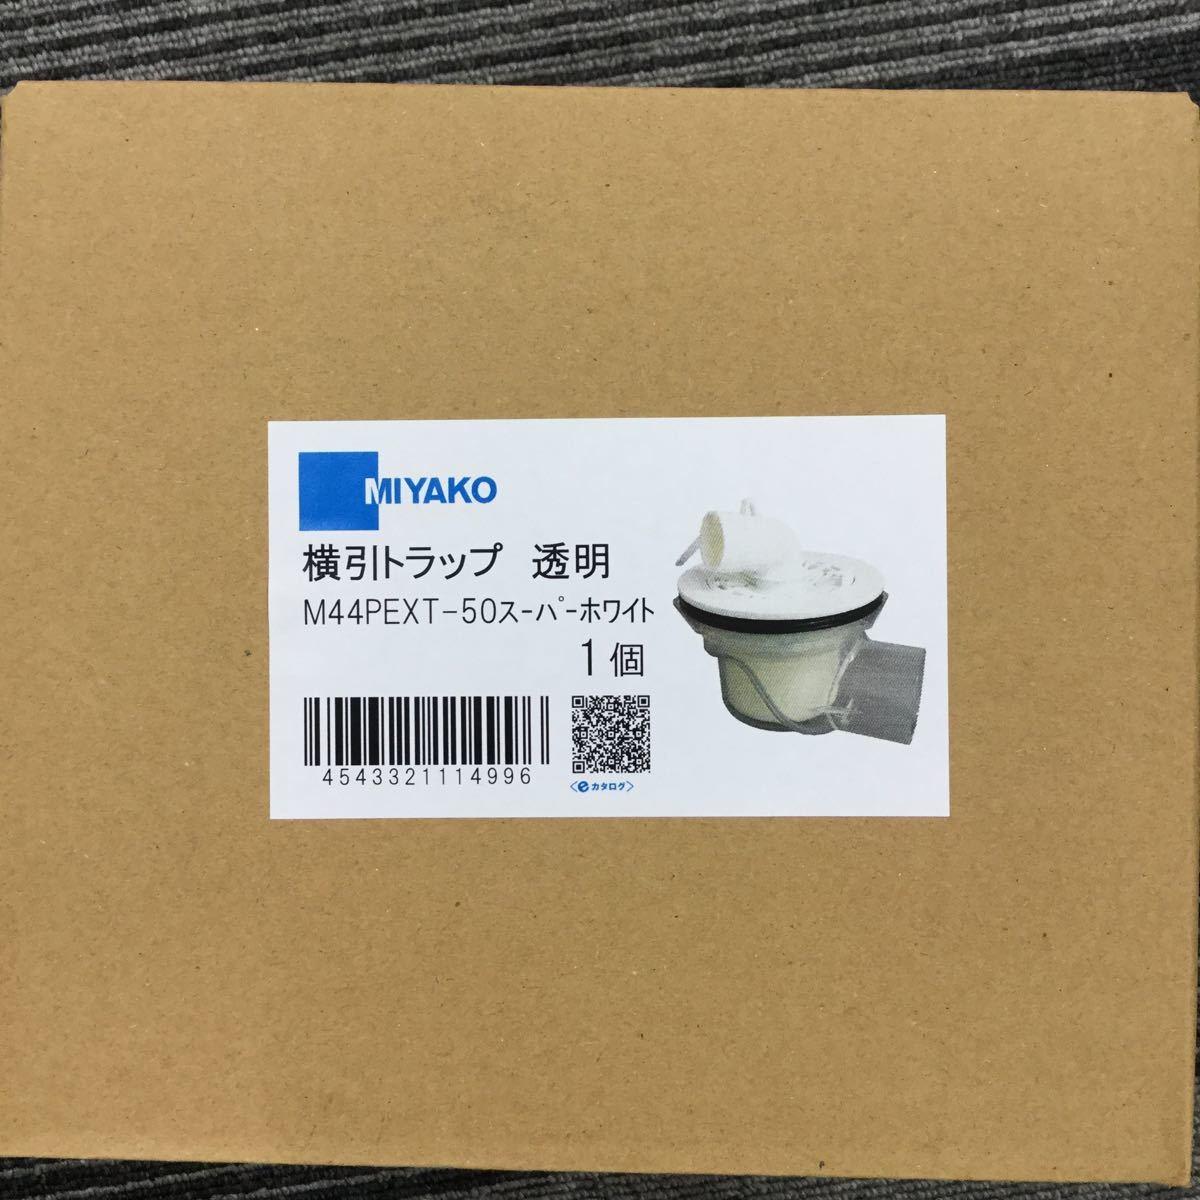 MIYAKO 横引トラップ 透明 M44PEXT-50 スーパーホワイト_画像1